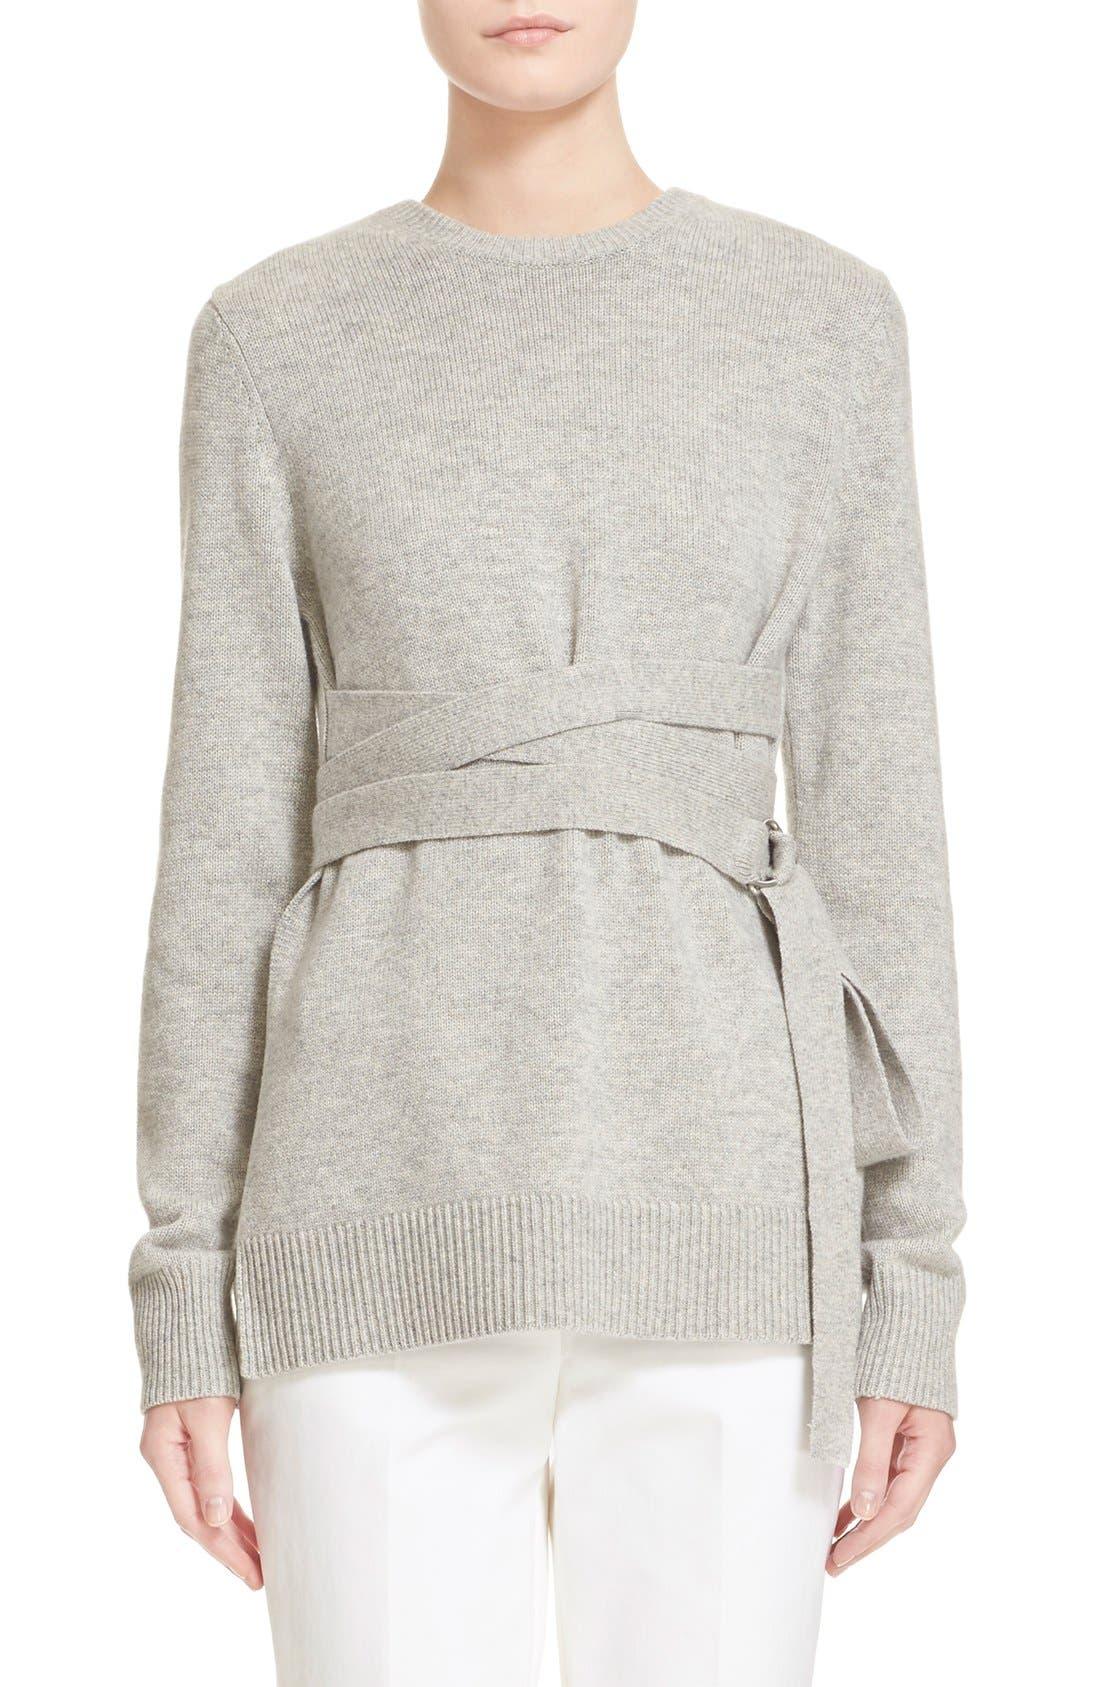 Alternate Image 1 Selected - Michael Kors Wrap Belt Cashmere Sweater